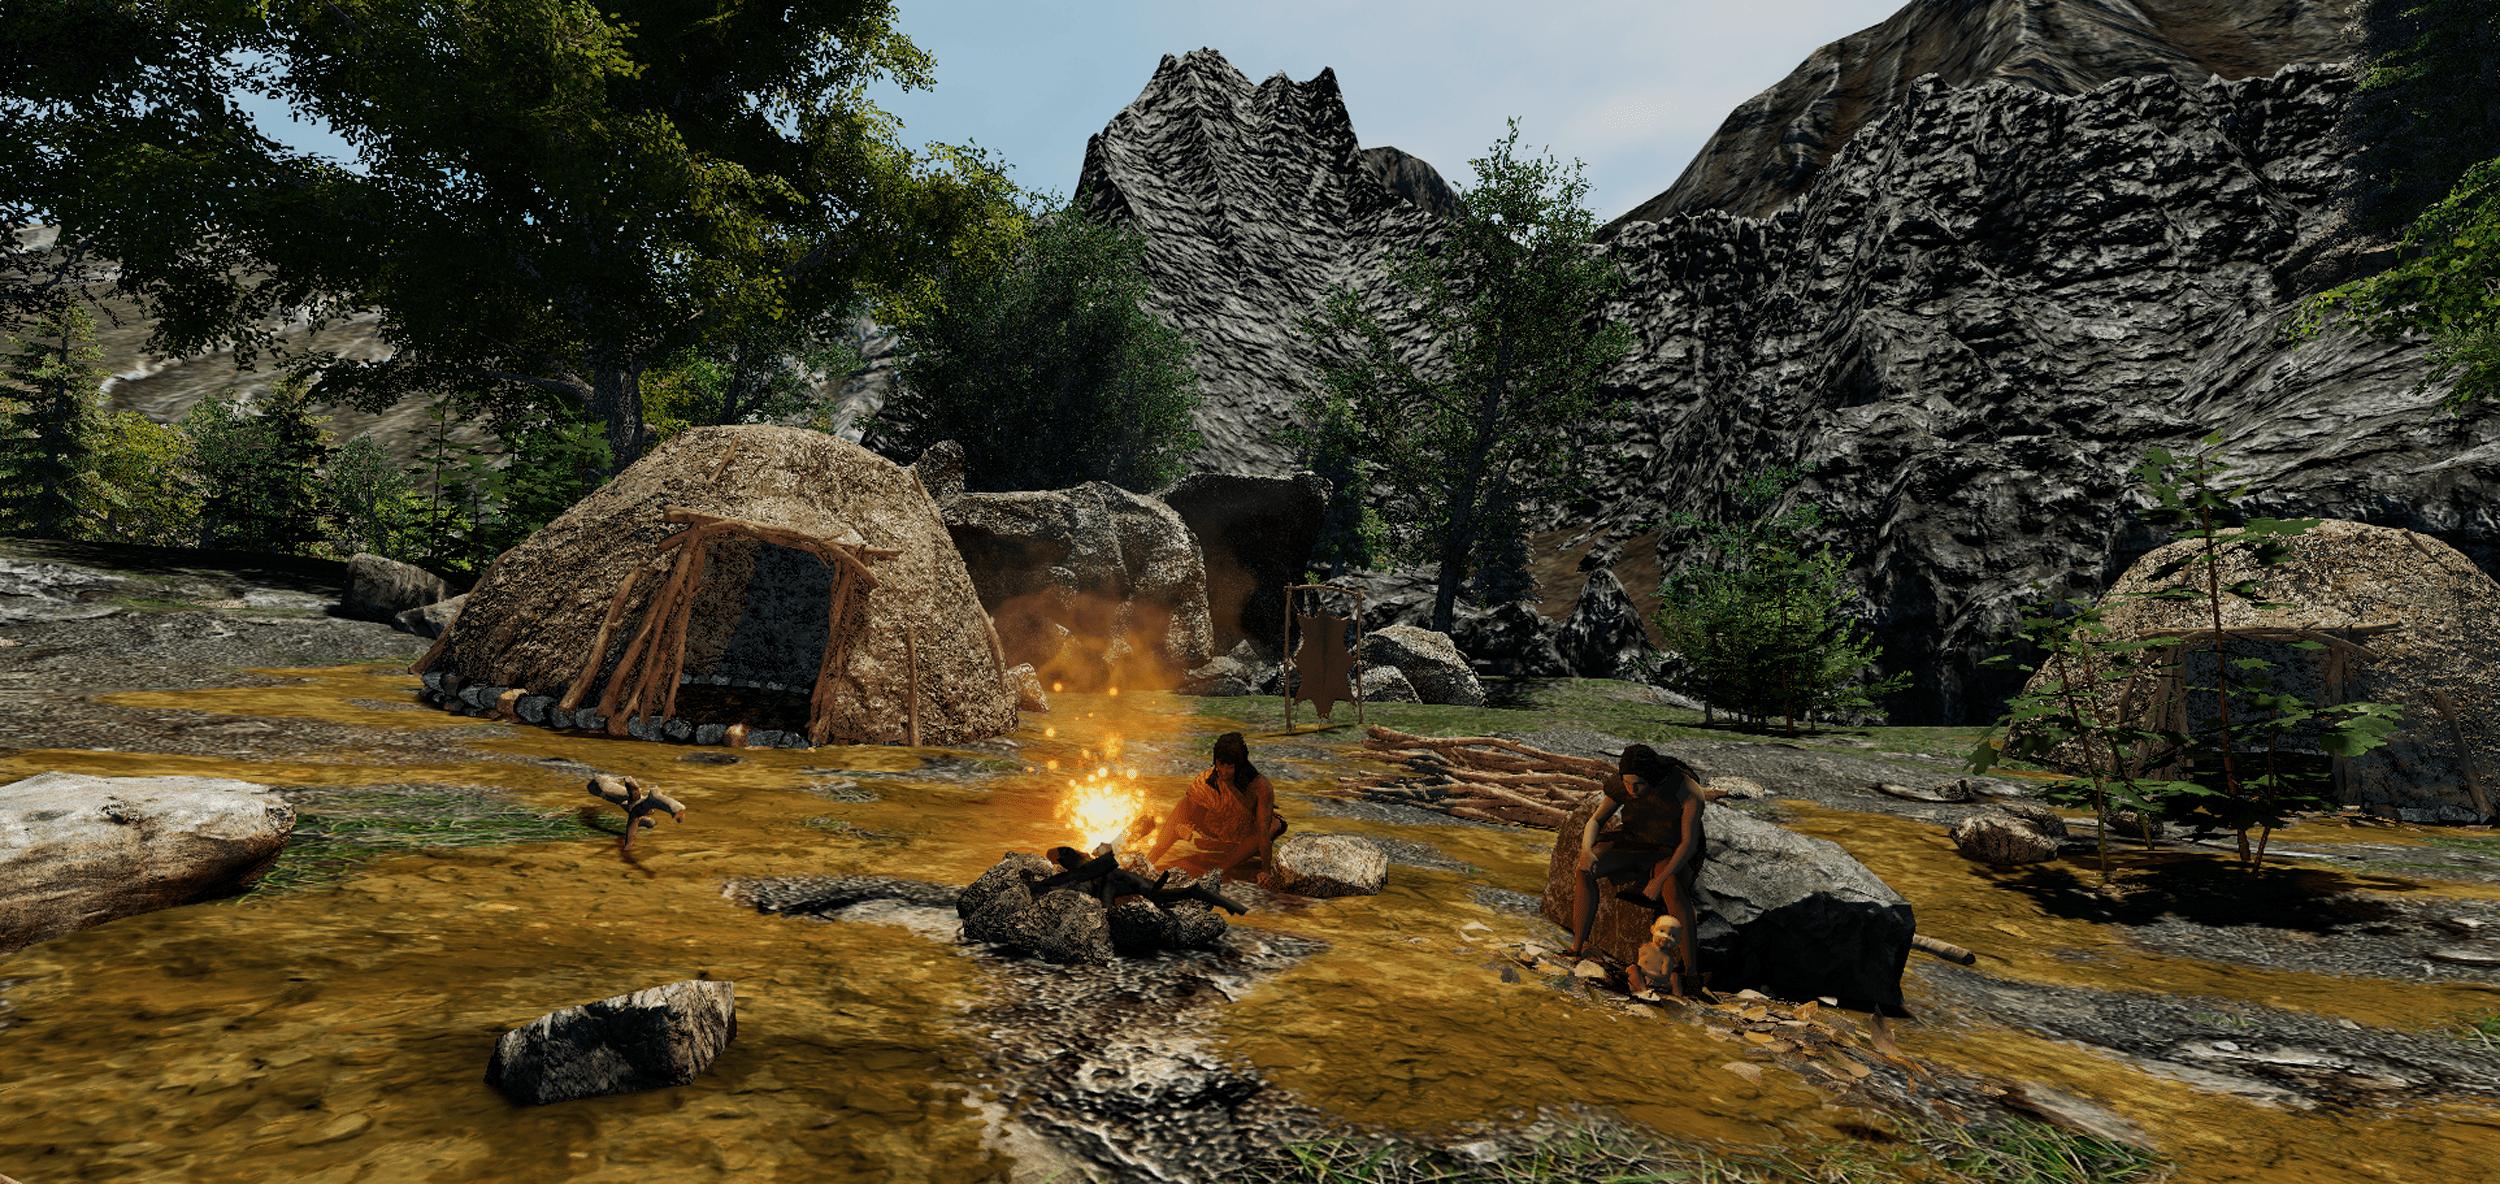 3D modeling - Prehistoric world - The Mesolithic